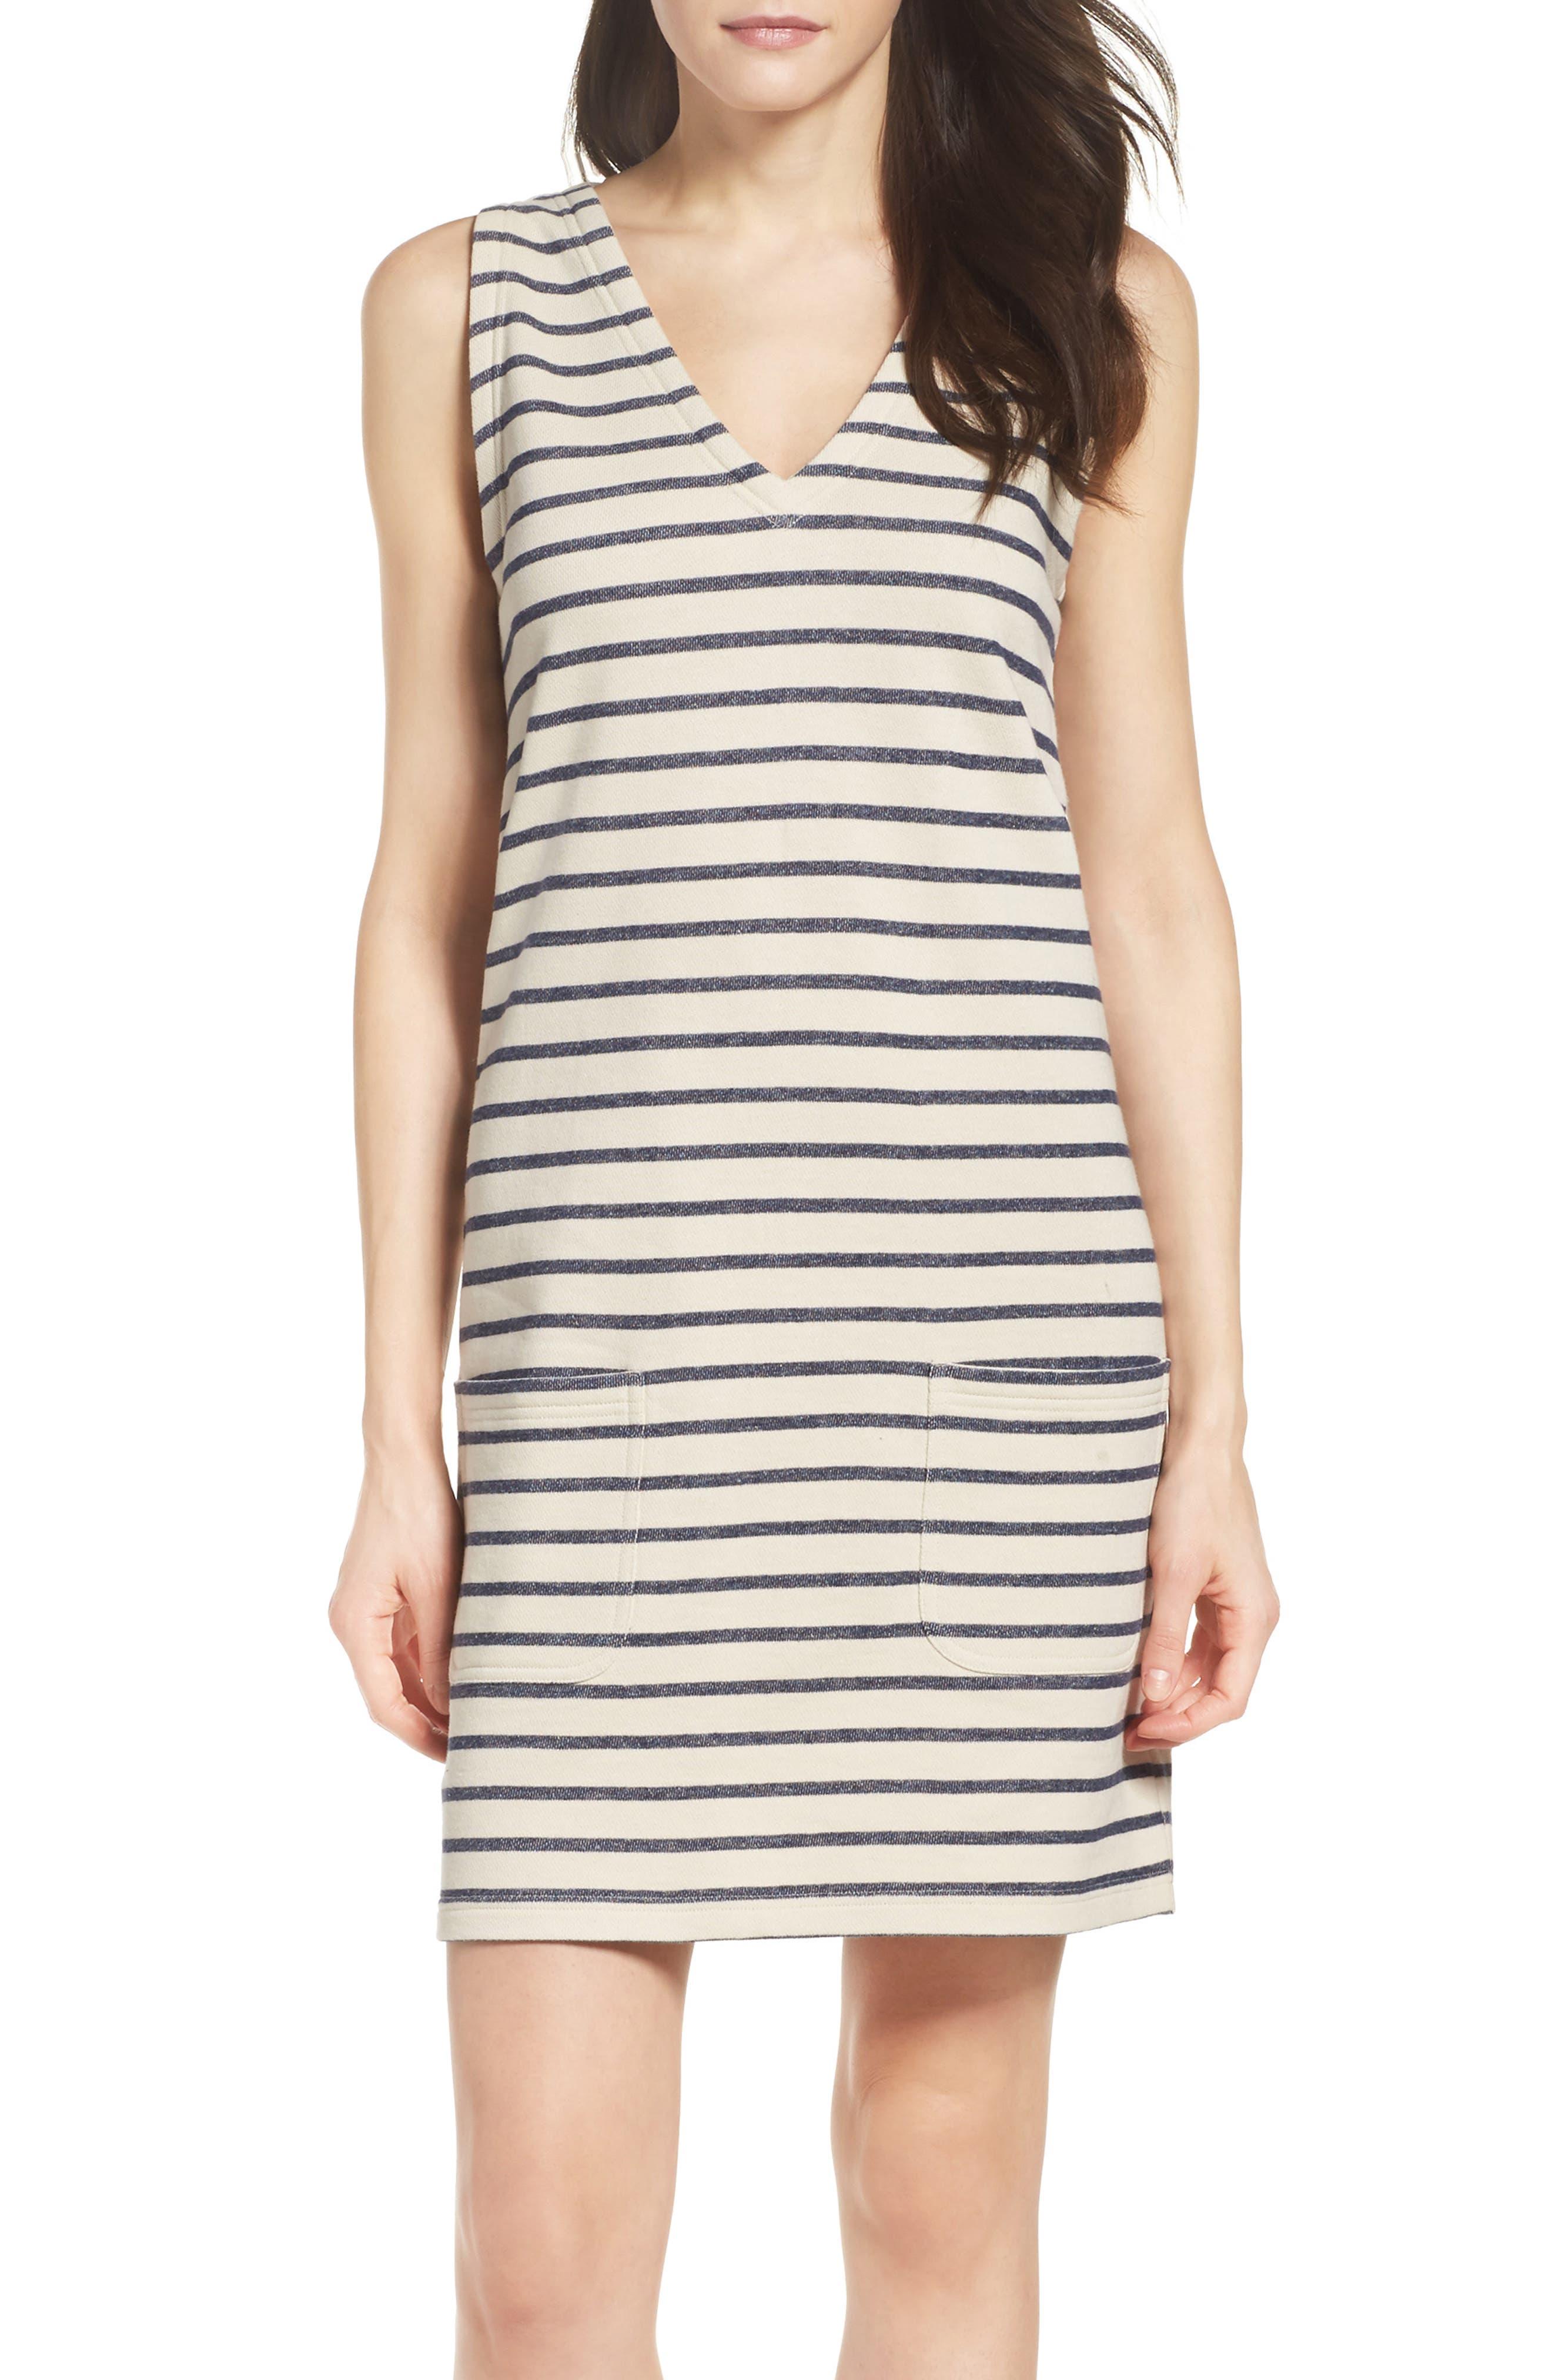 Normandy Stripe Dress,                             Main thumbnail 1, color,                             Brule/ Indigo